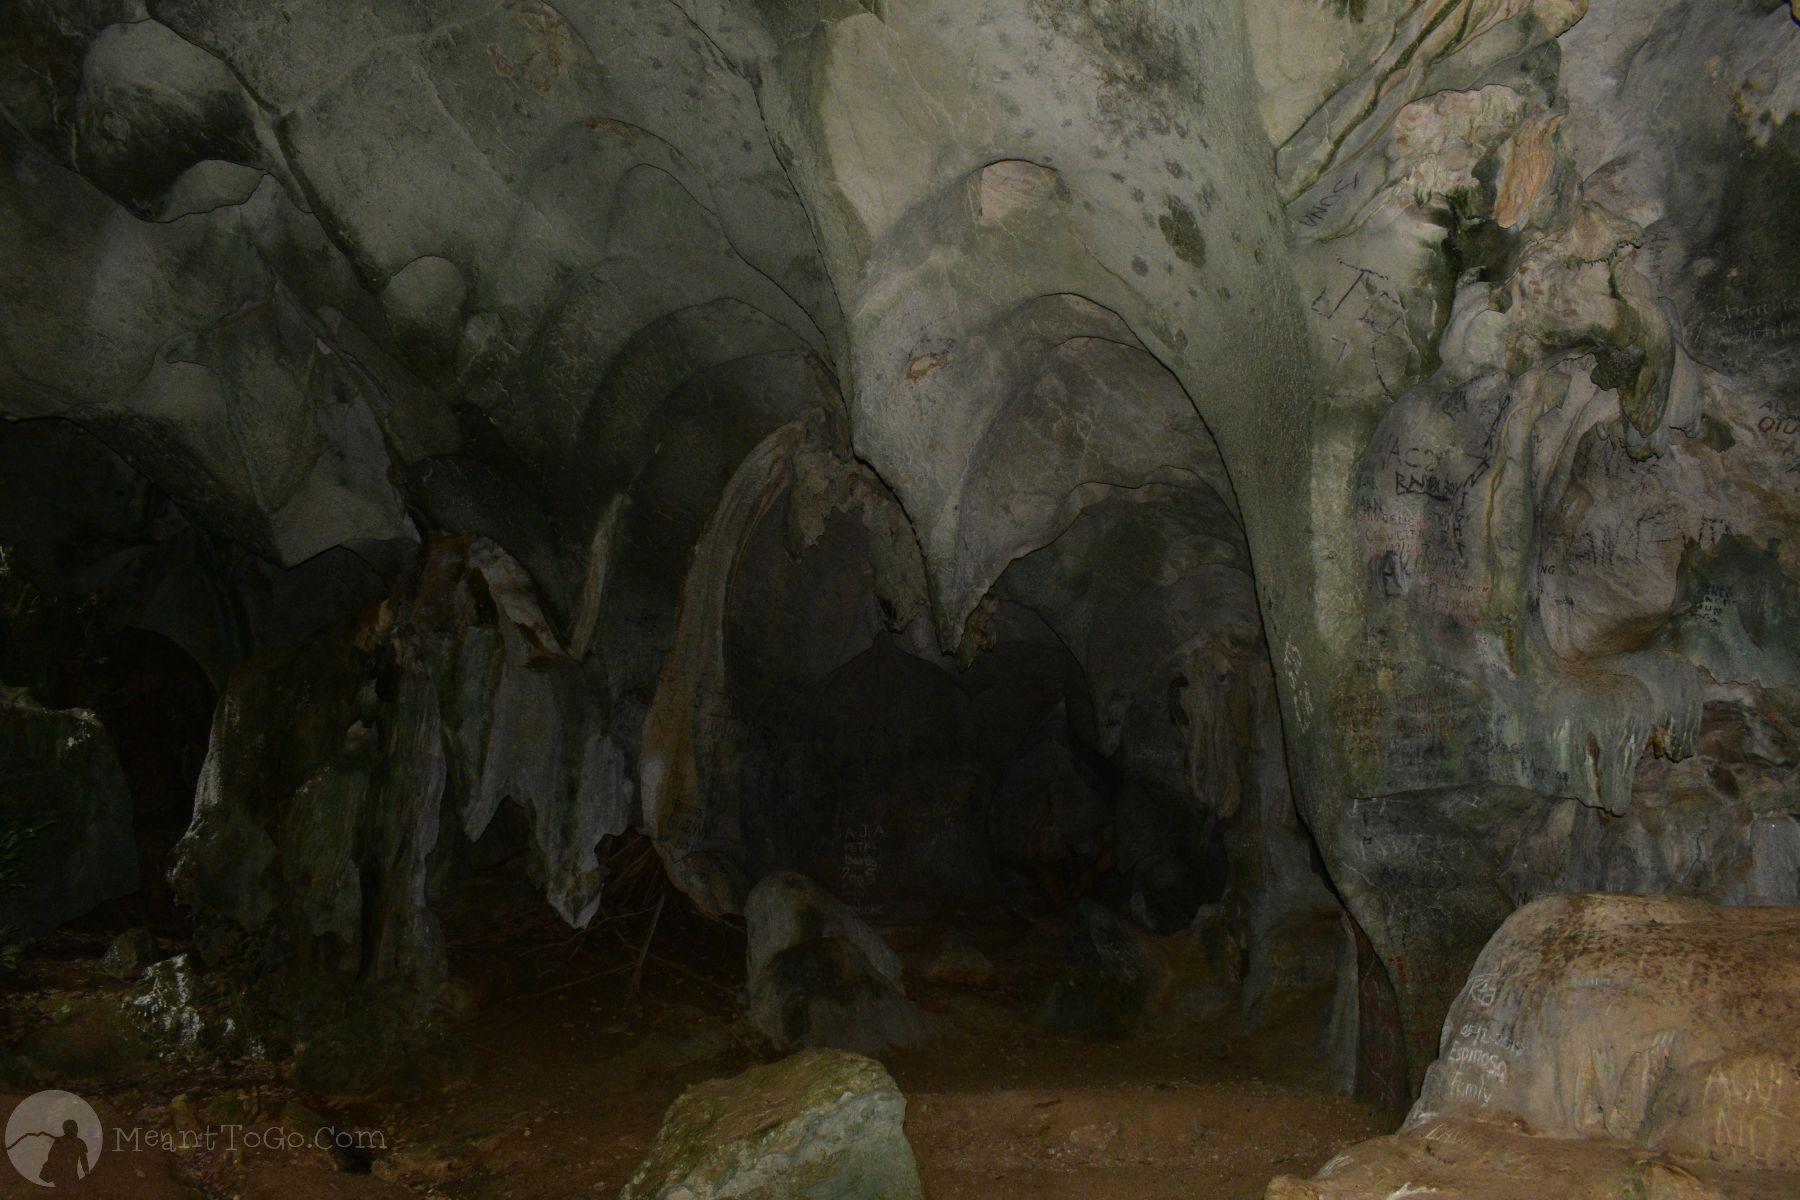 Pawikan Cave, Islas de Gigantes, Carles, Iloilo, Philippines